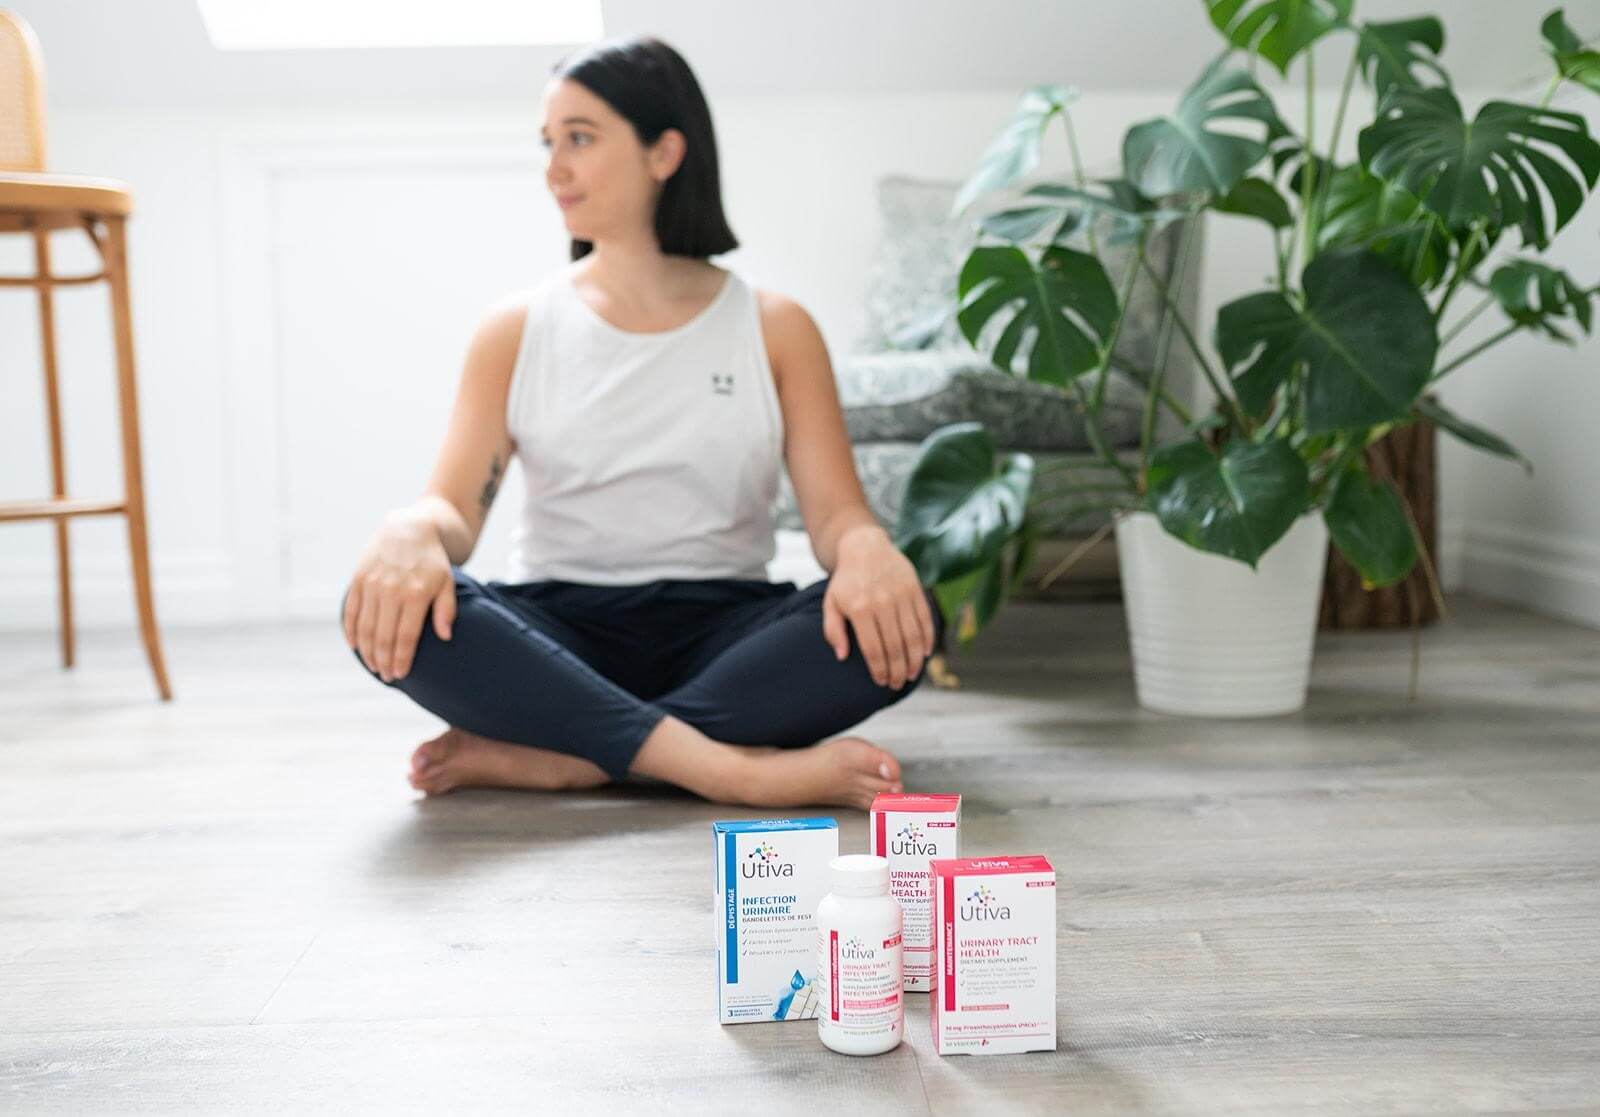 woman meditating sitting on floor